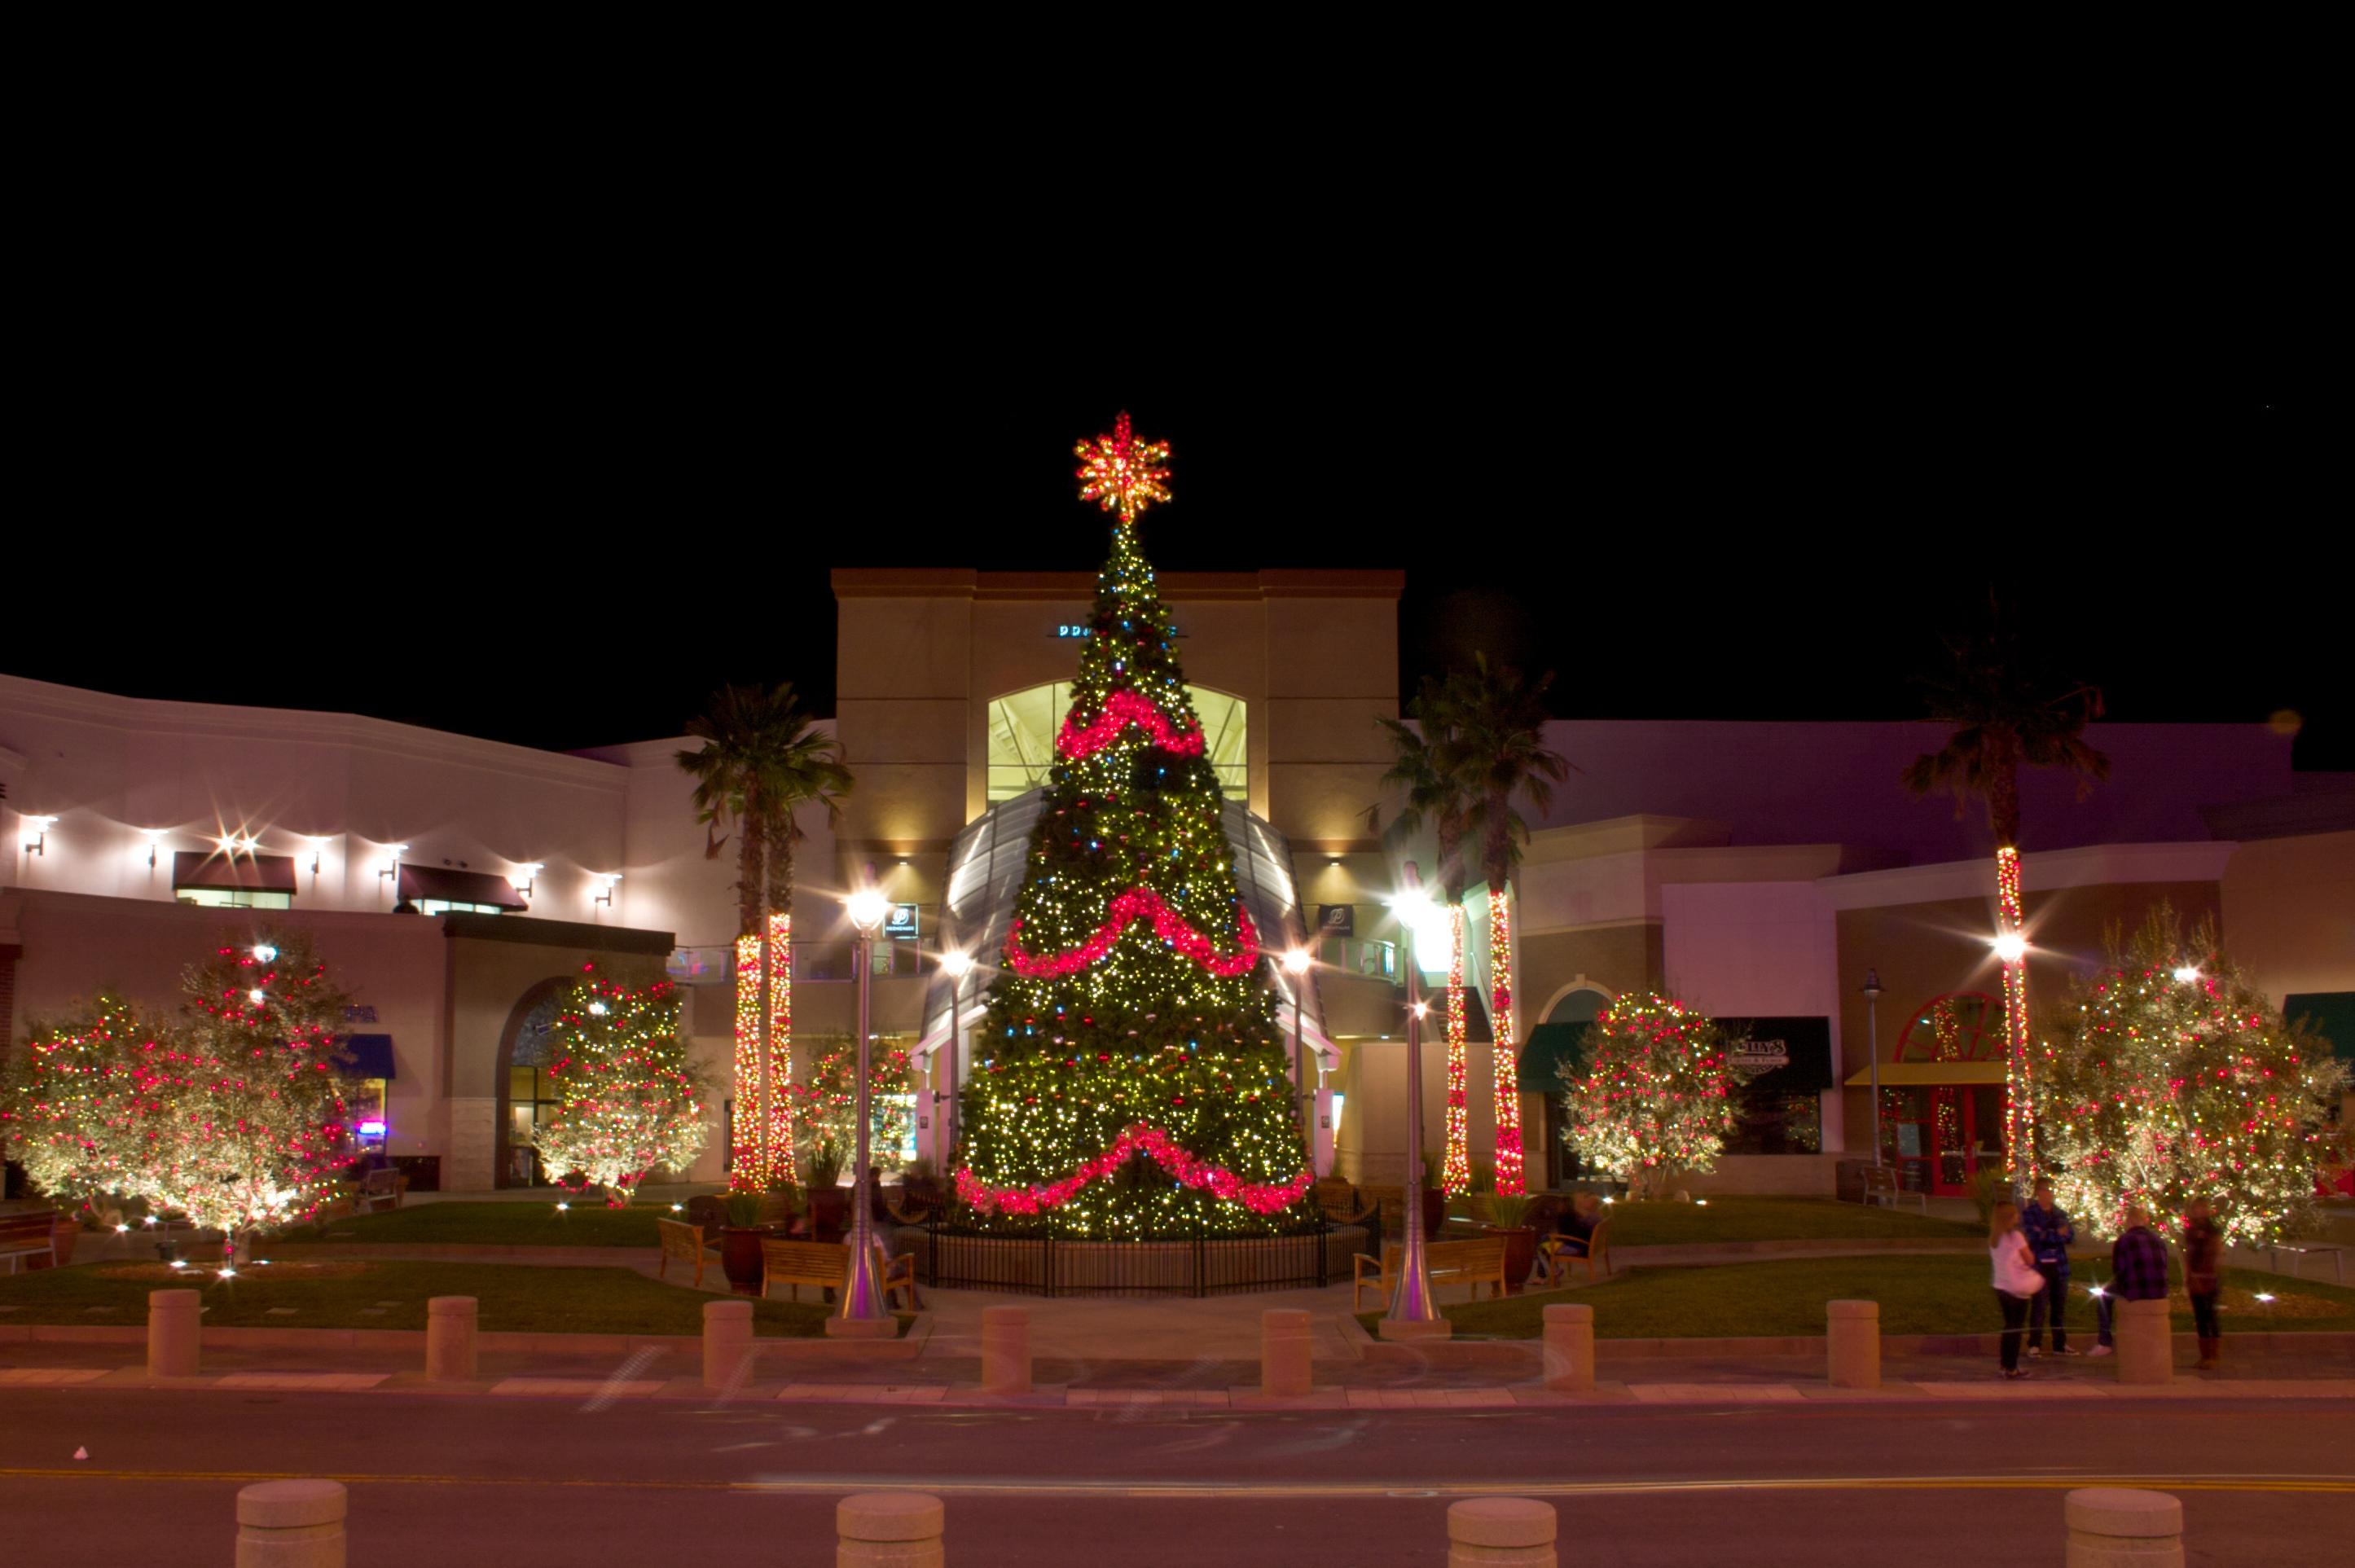 Christmas King Light Install Pros Rancho Cucamonga 10808 Foothill